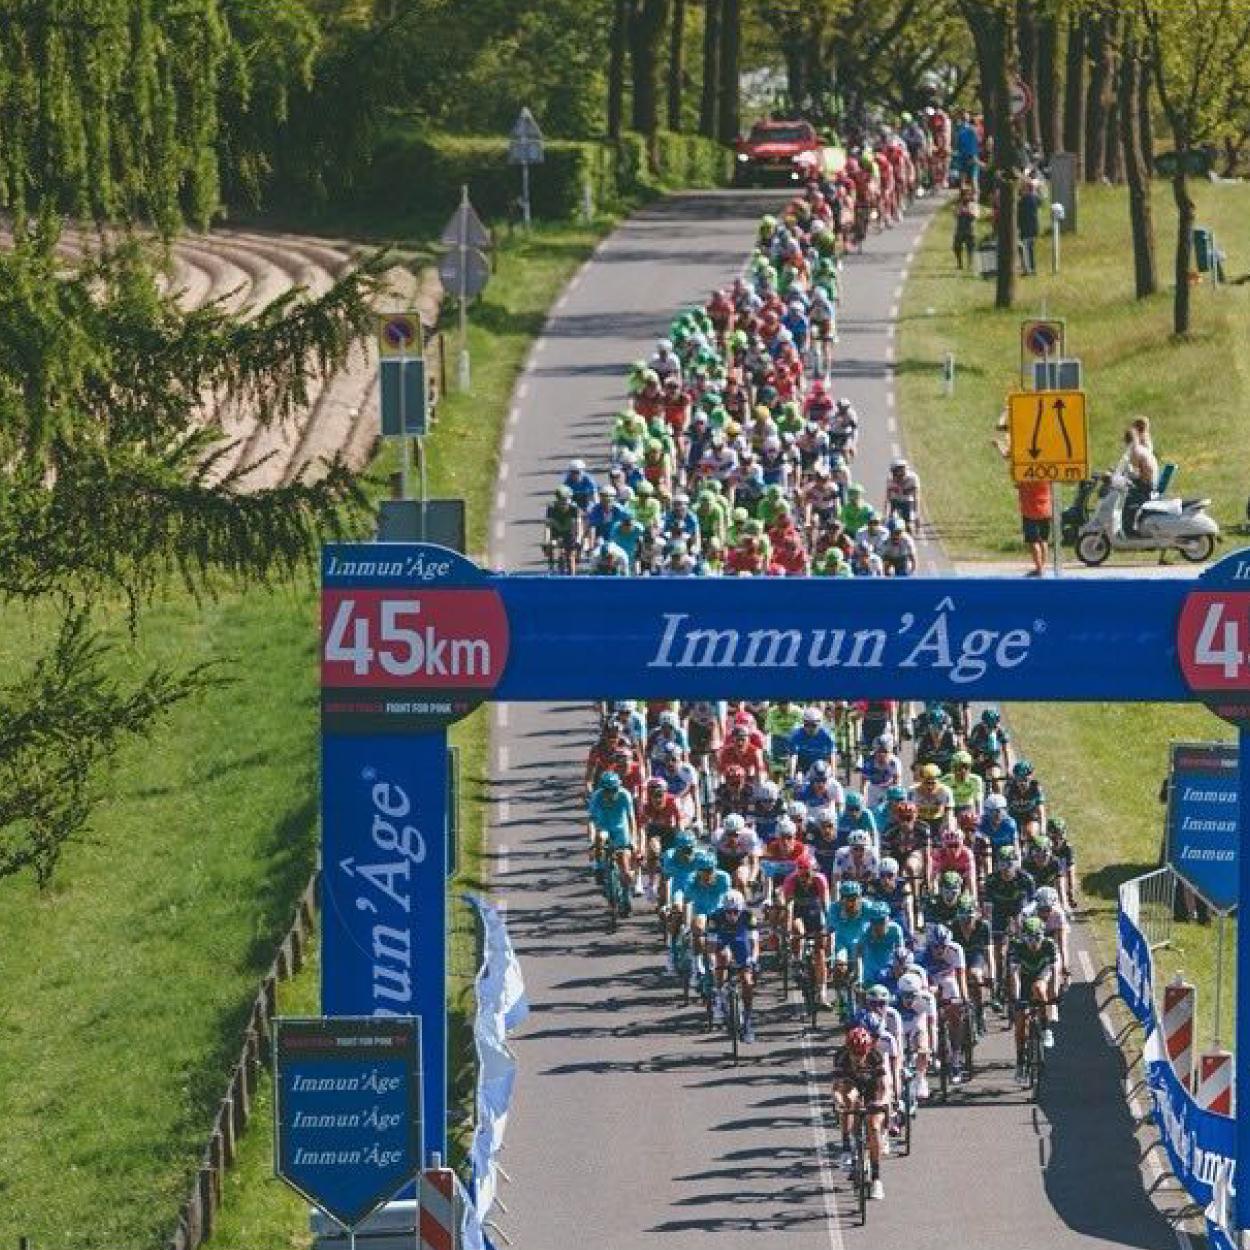 Immun' Âge Giro d'Italia(ジロ・デ・イタリア)Official Sponsor